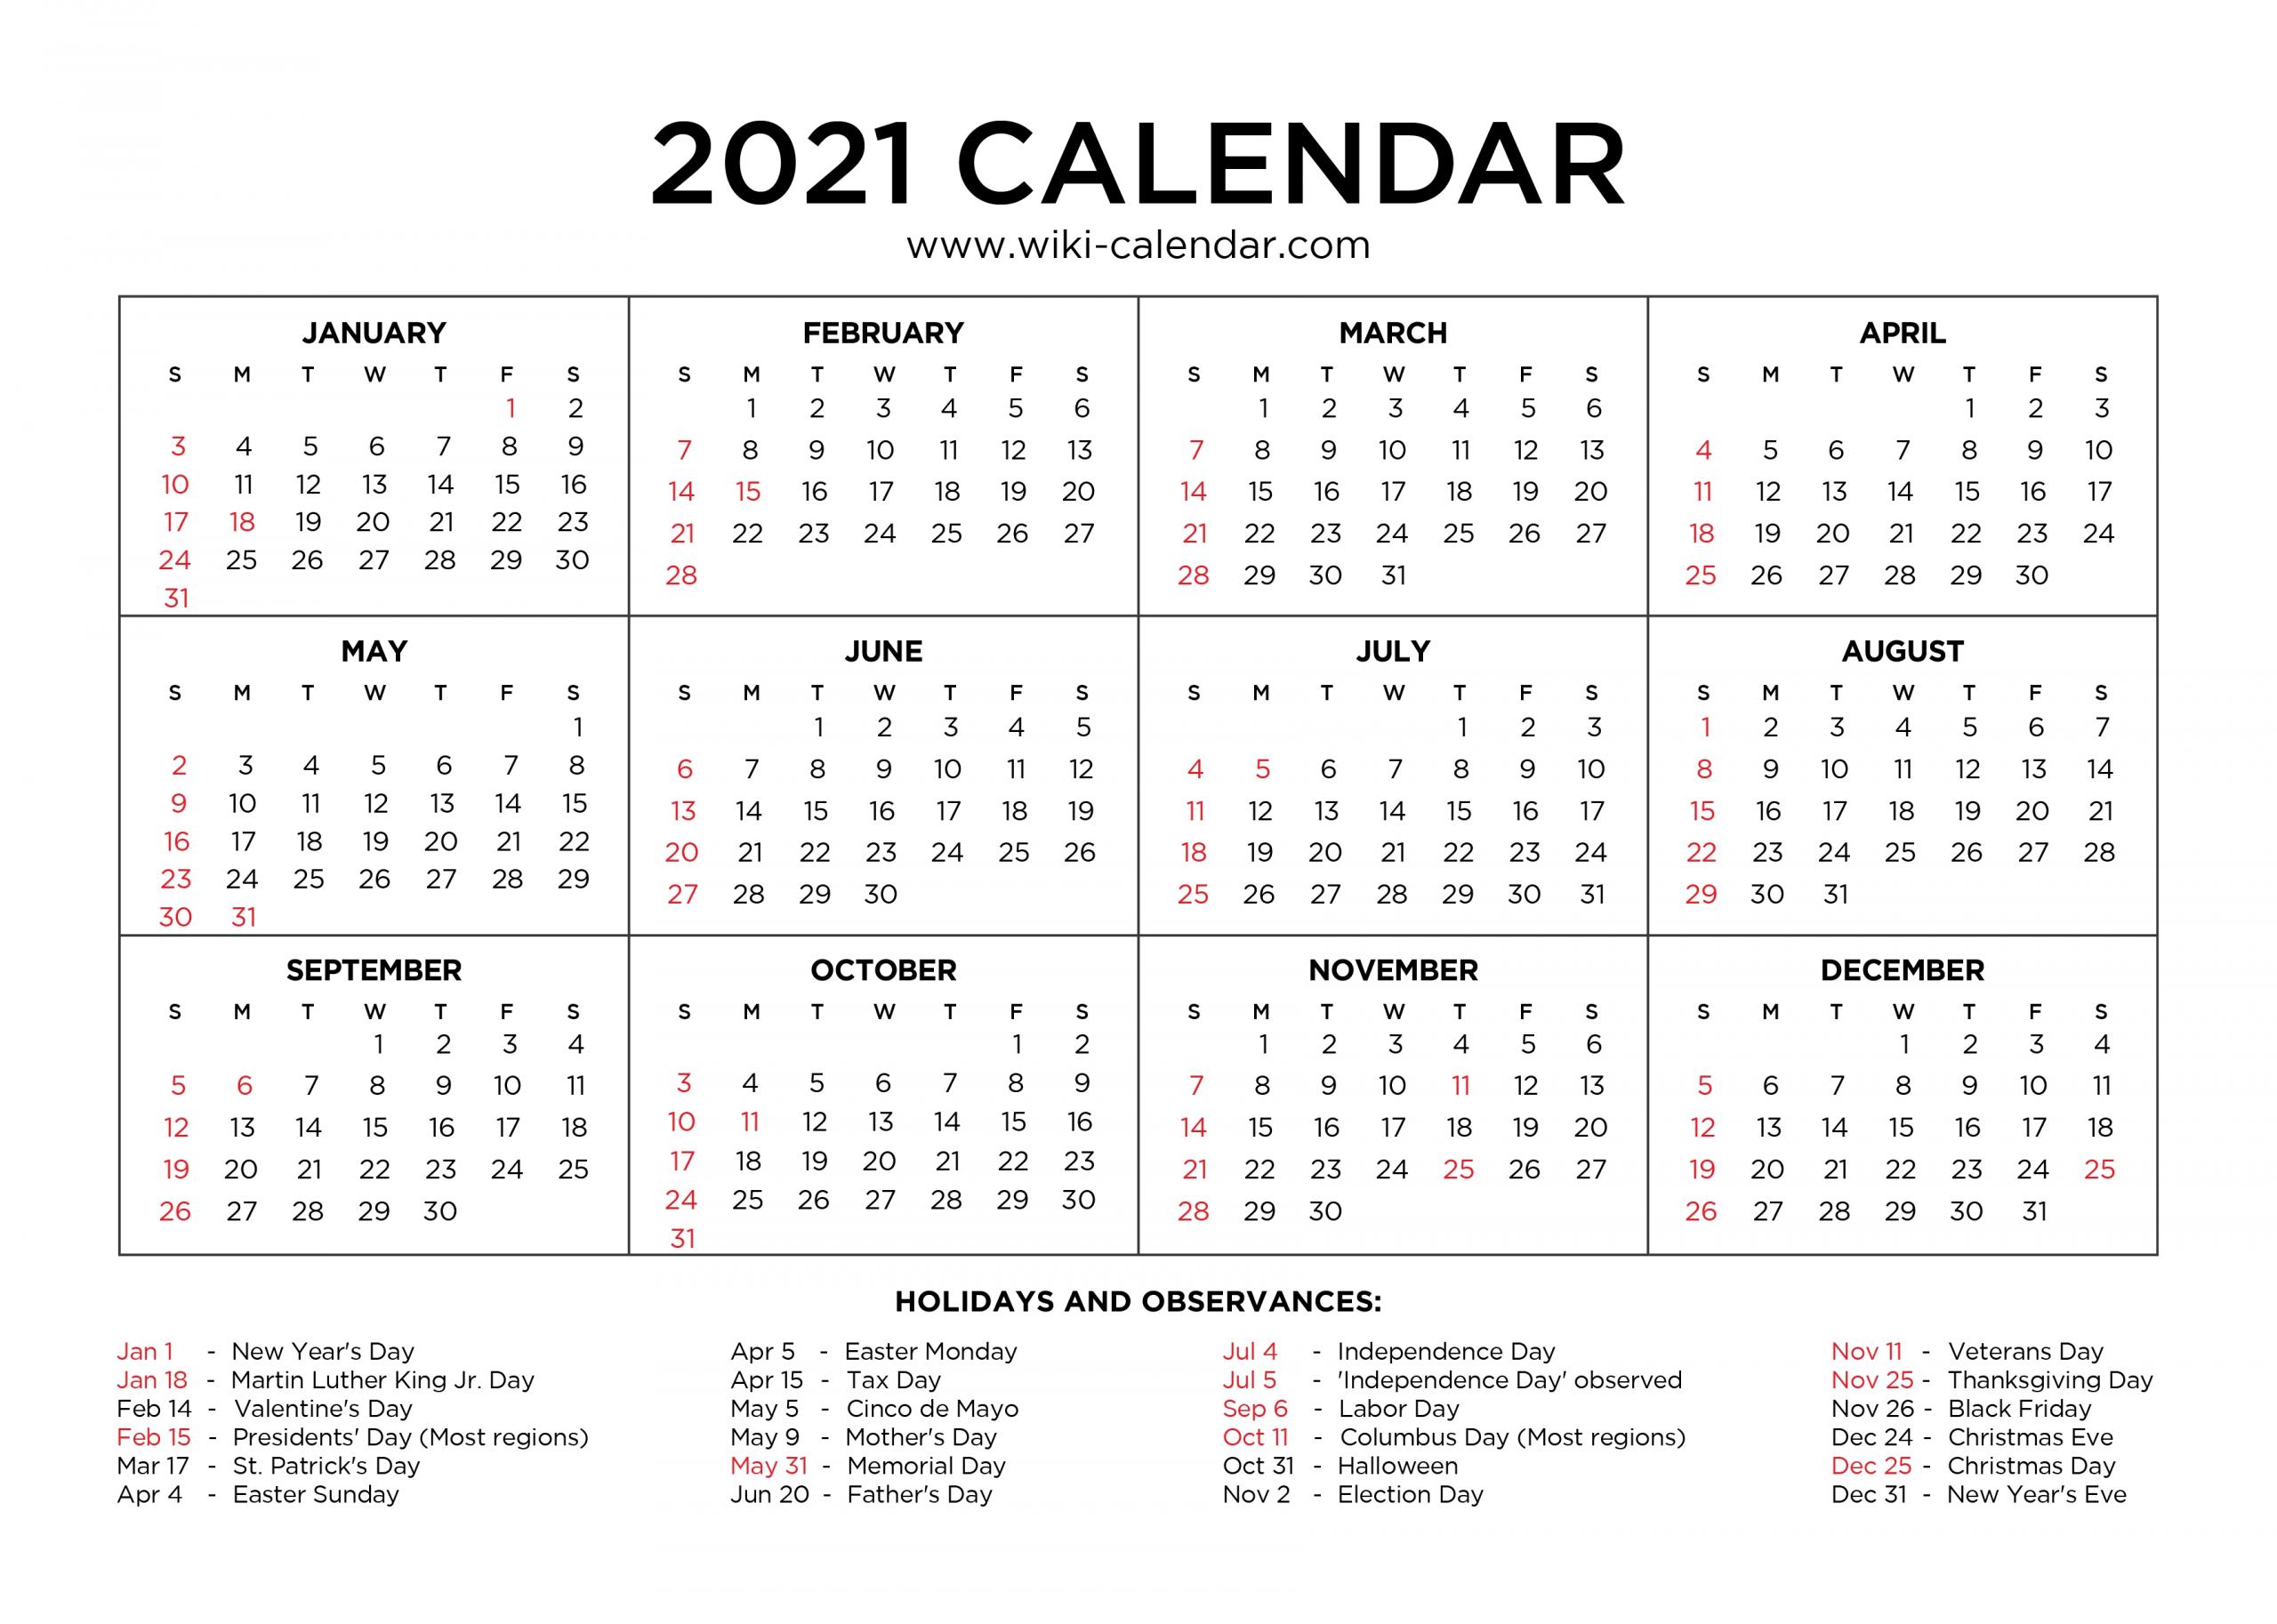 Free Printable Year 2021 Calendar With Holidays-Free Printable Calendar 2021 Without Download